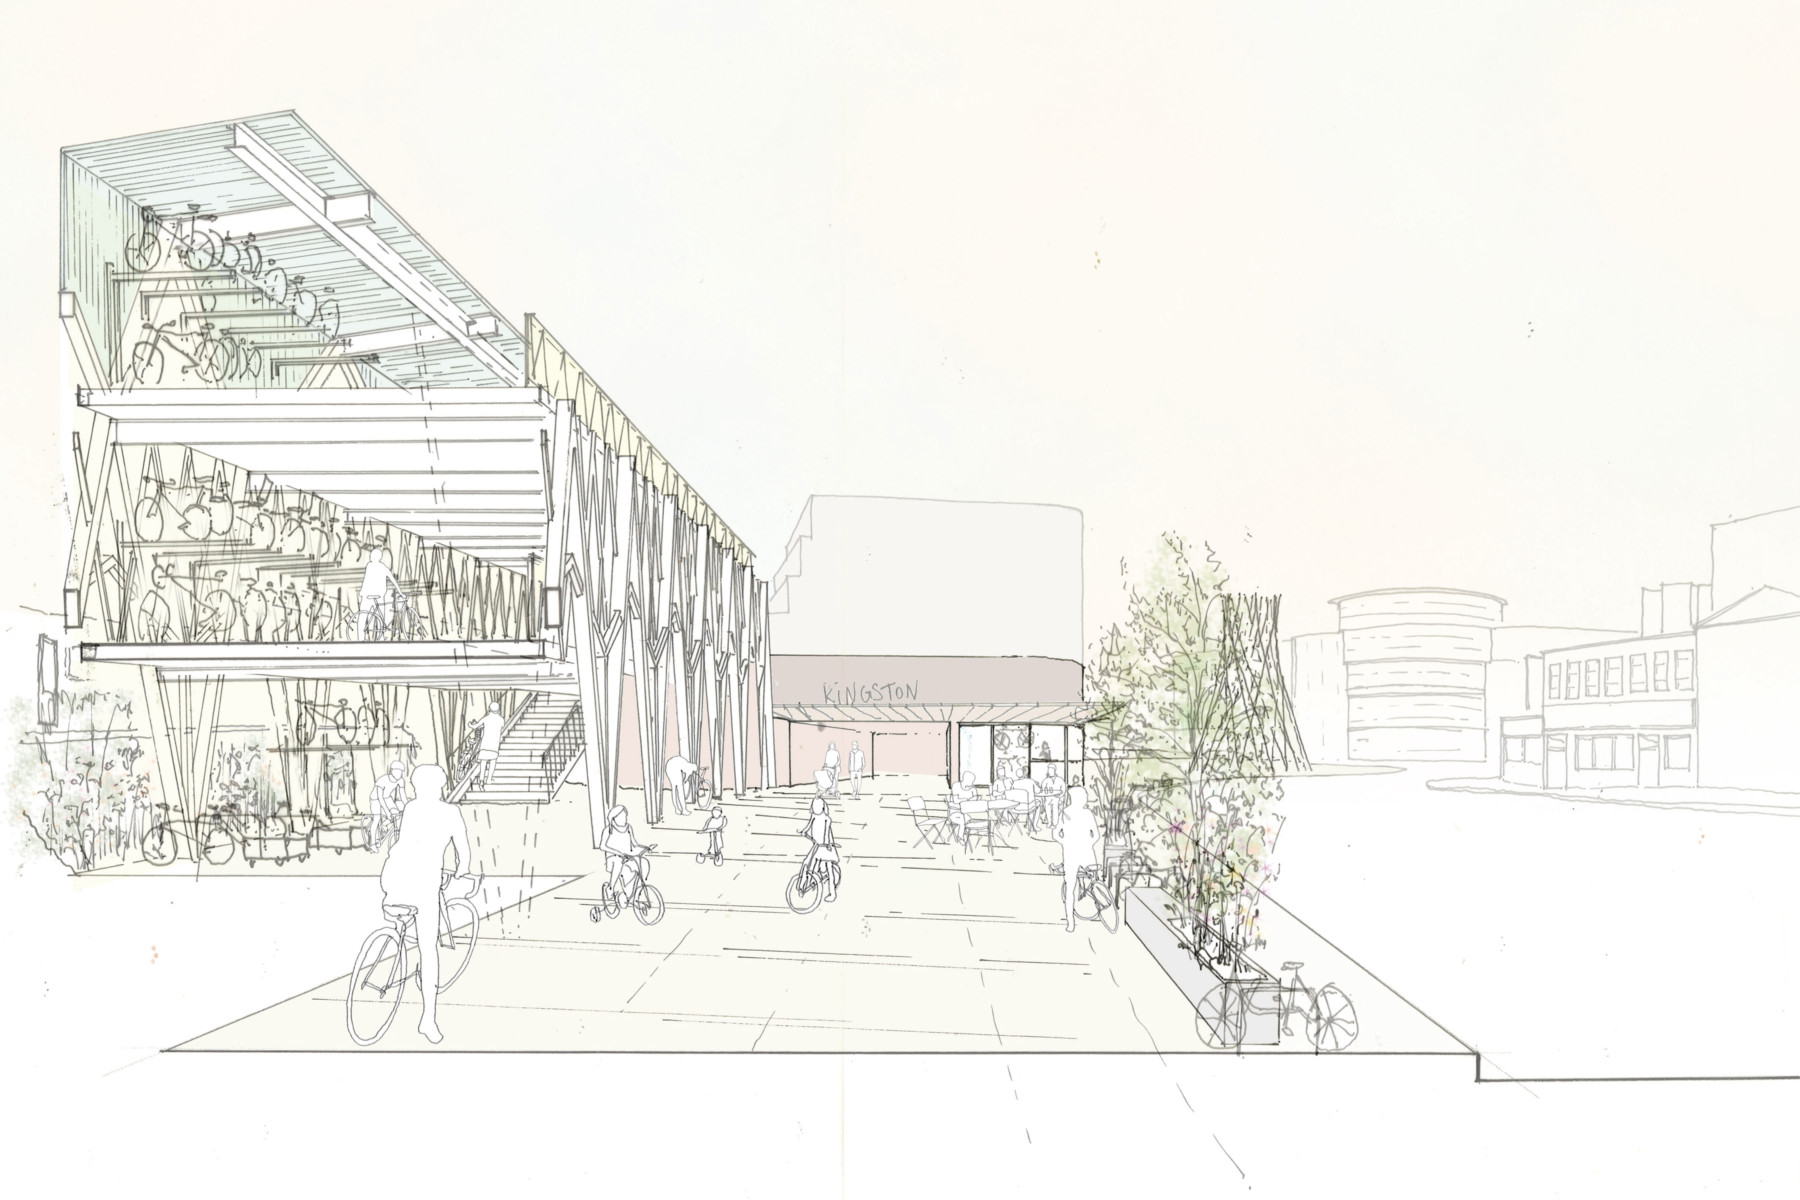 Sarah-Wigglesworth-Architects Kingston-Mini-Holland Hub 5 Perspective 3600